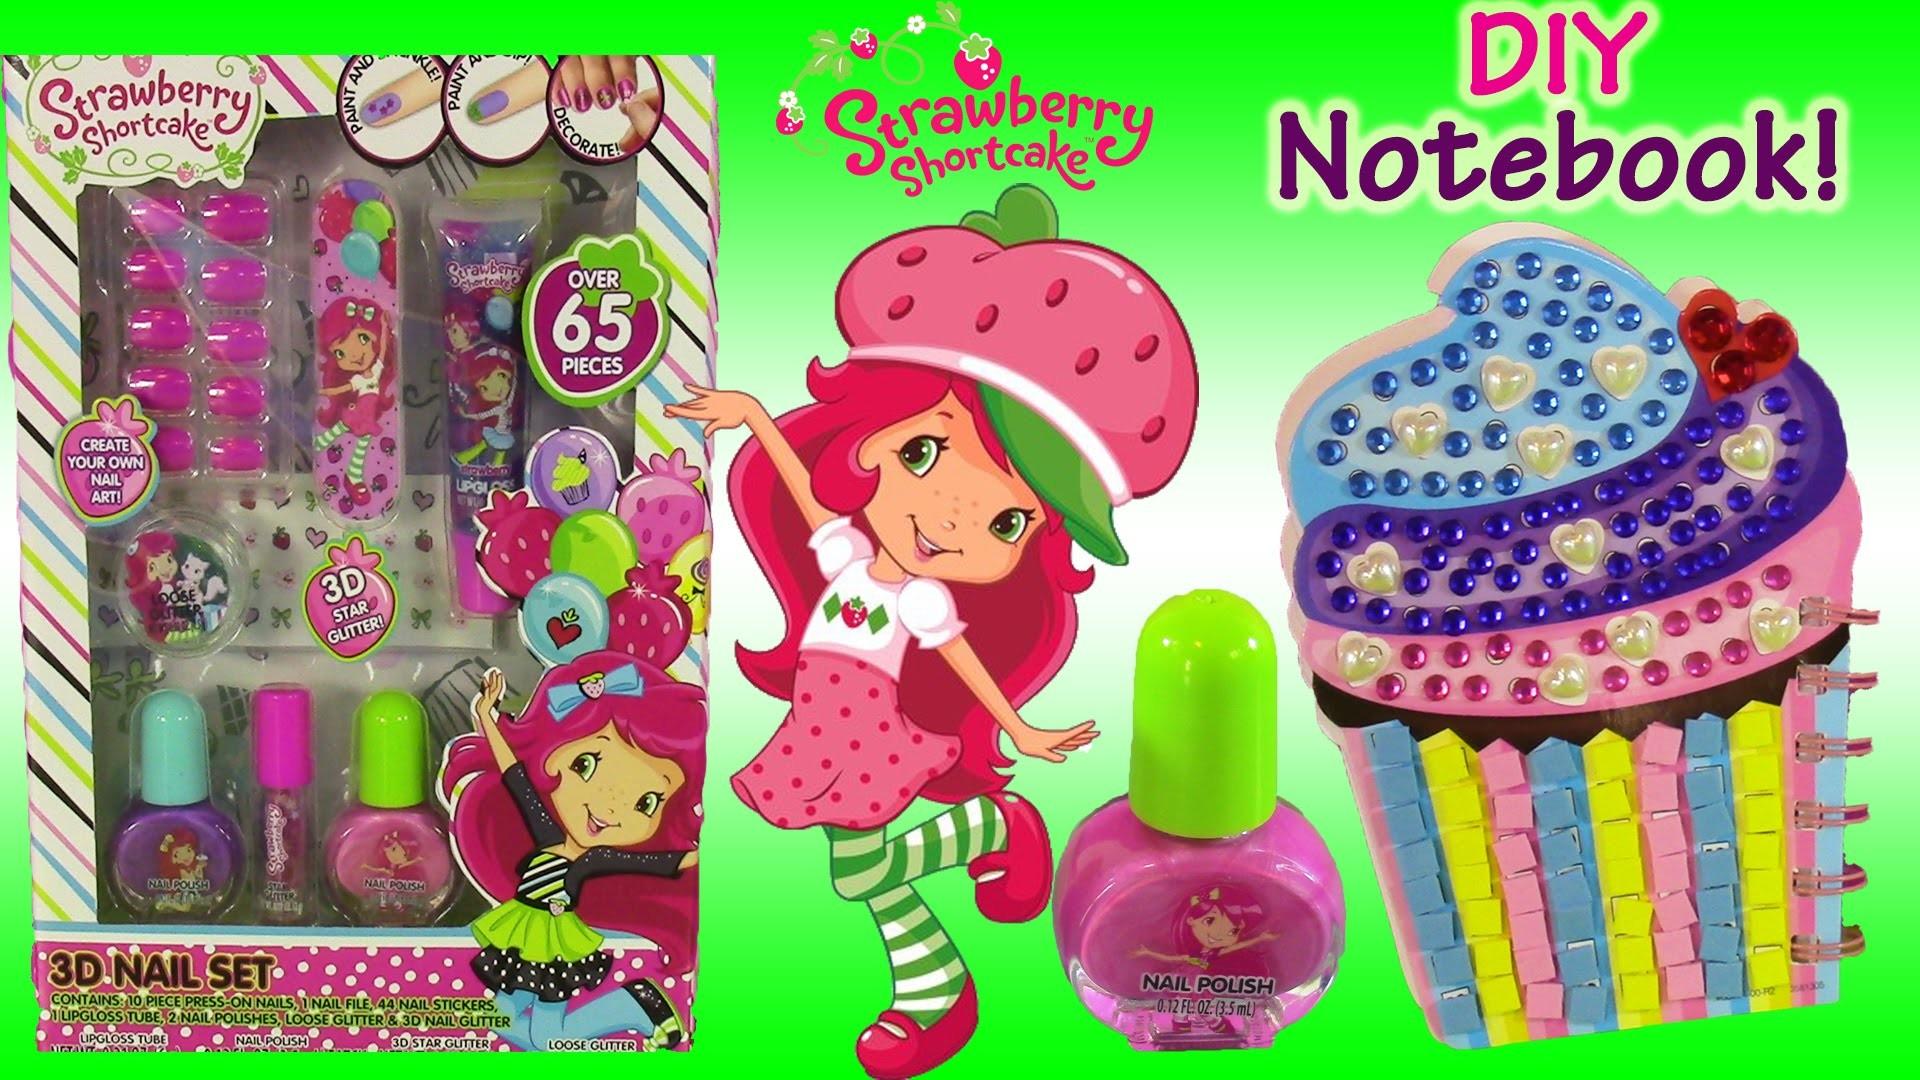 Strawberry Shortcake 3D Nail Set! Nail Polish Lip Gloss! DIY Cupcake Stick 'N Style Book! FUN